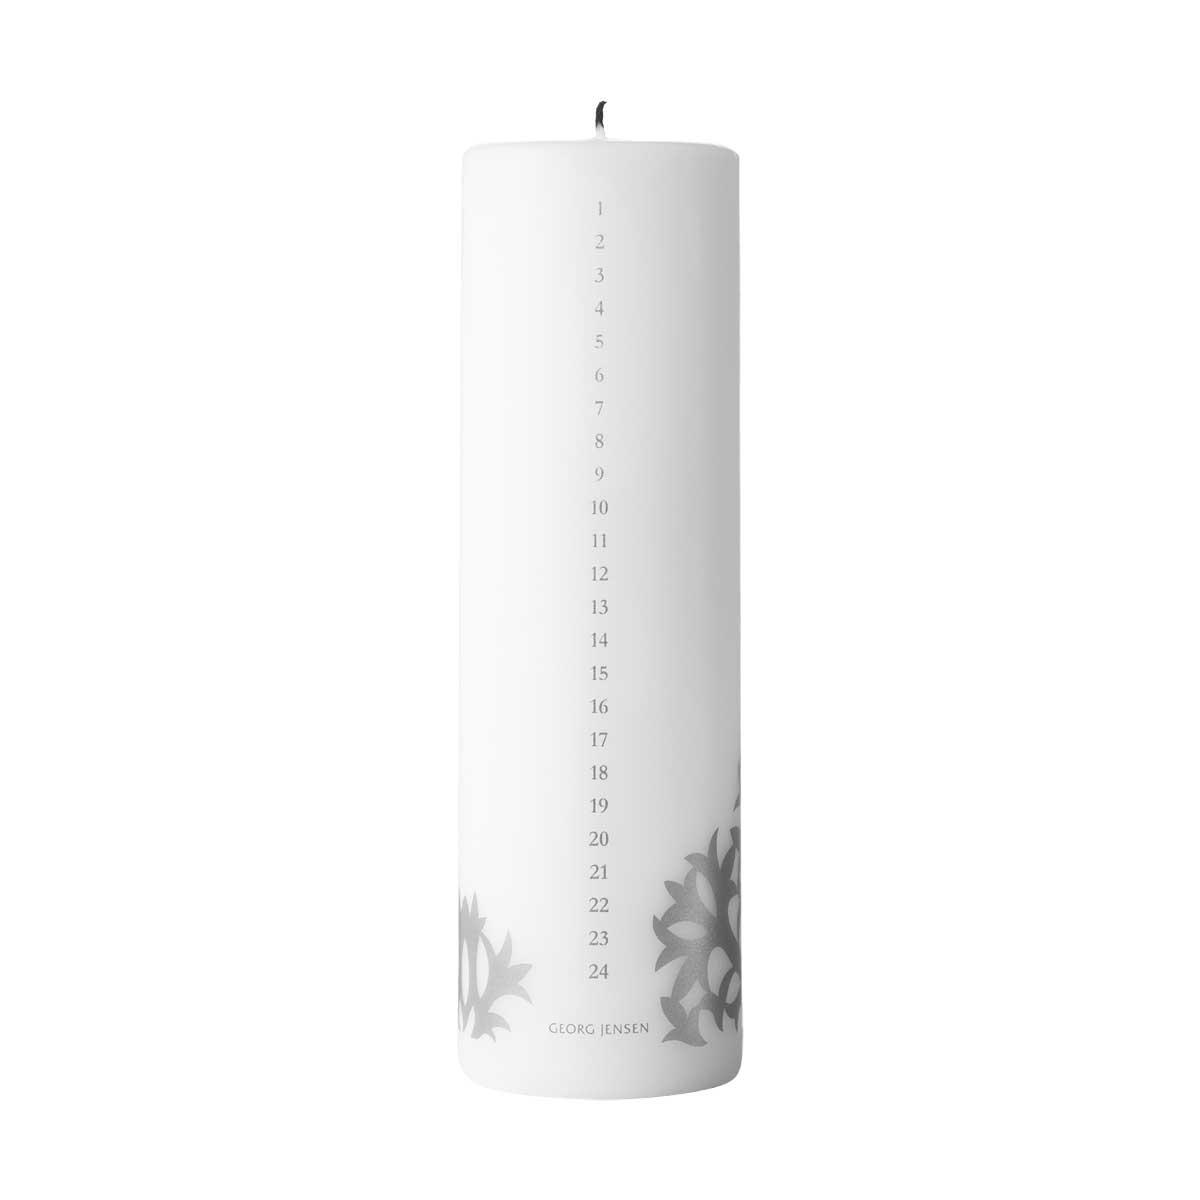 pack 10017723 cc 2020 calendar candle silver